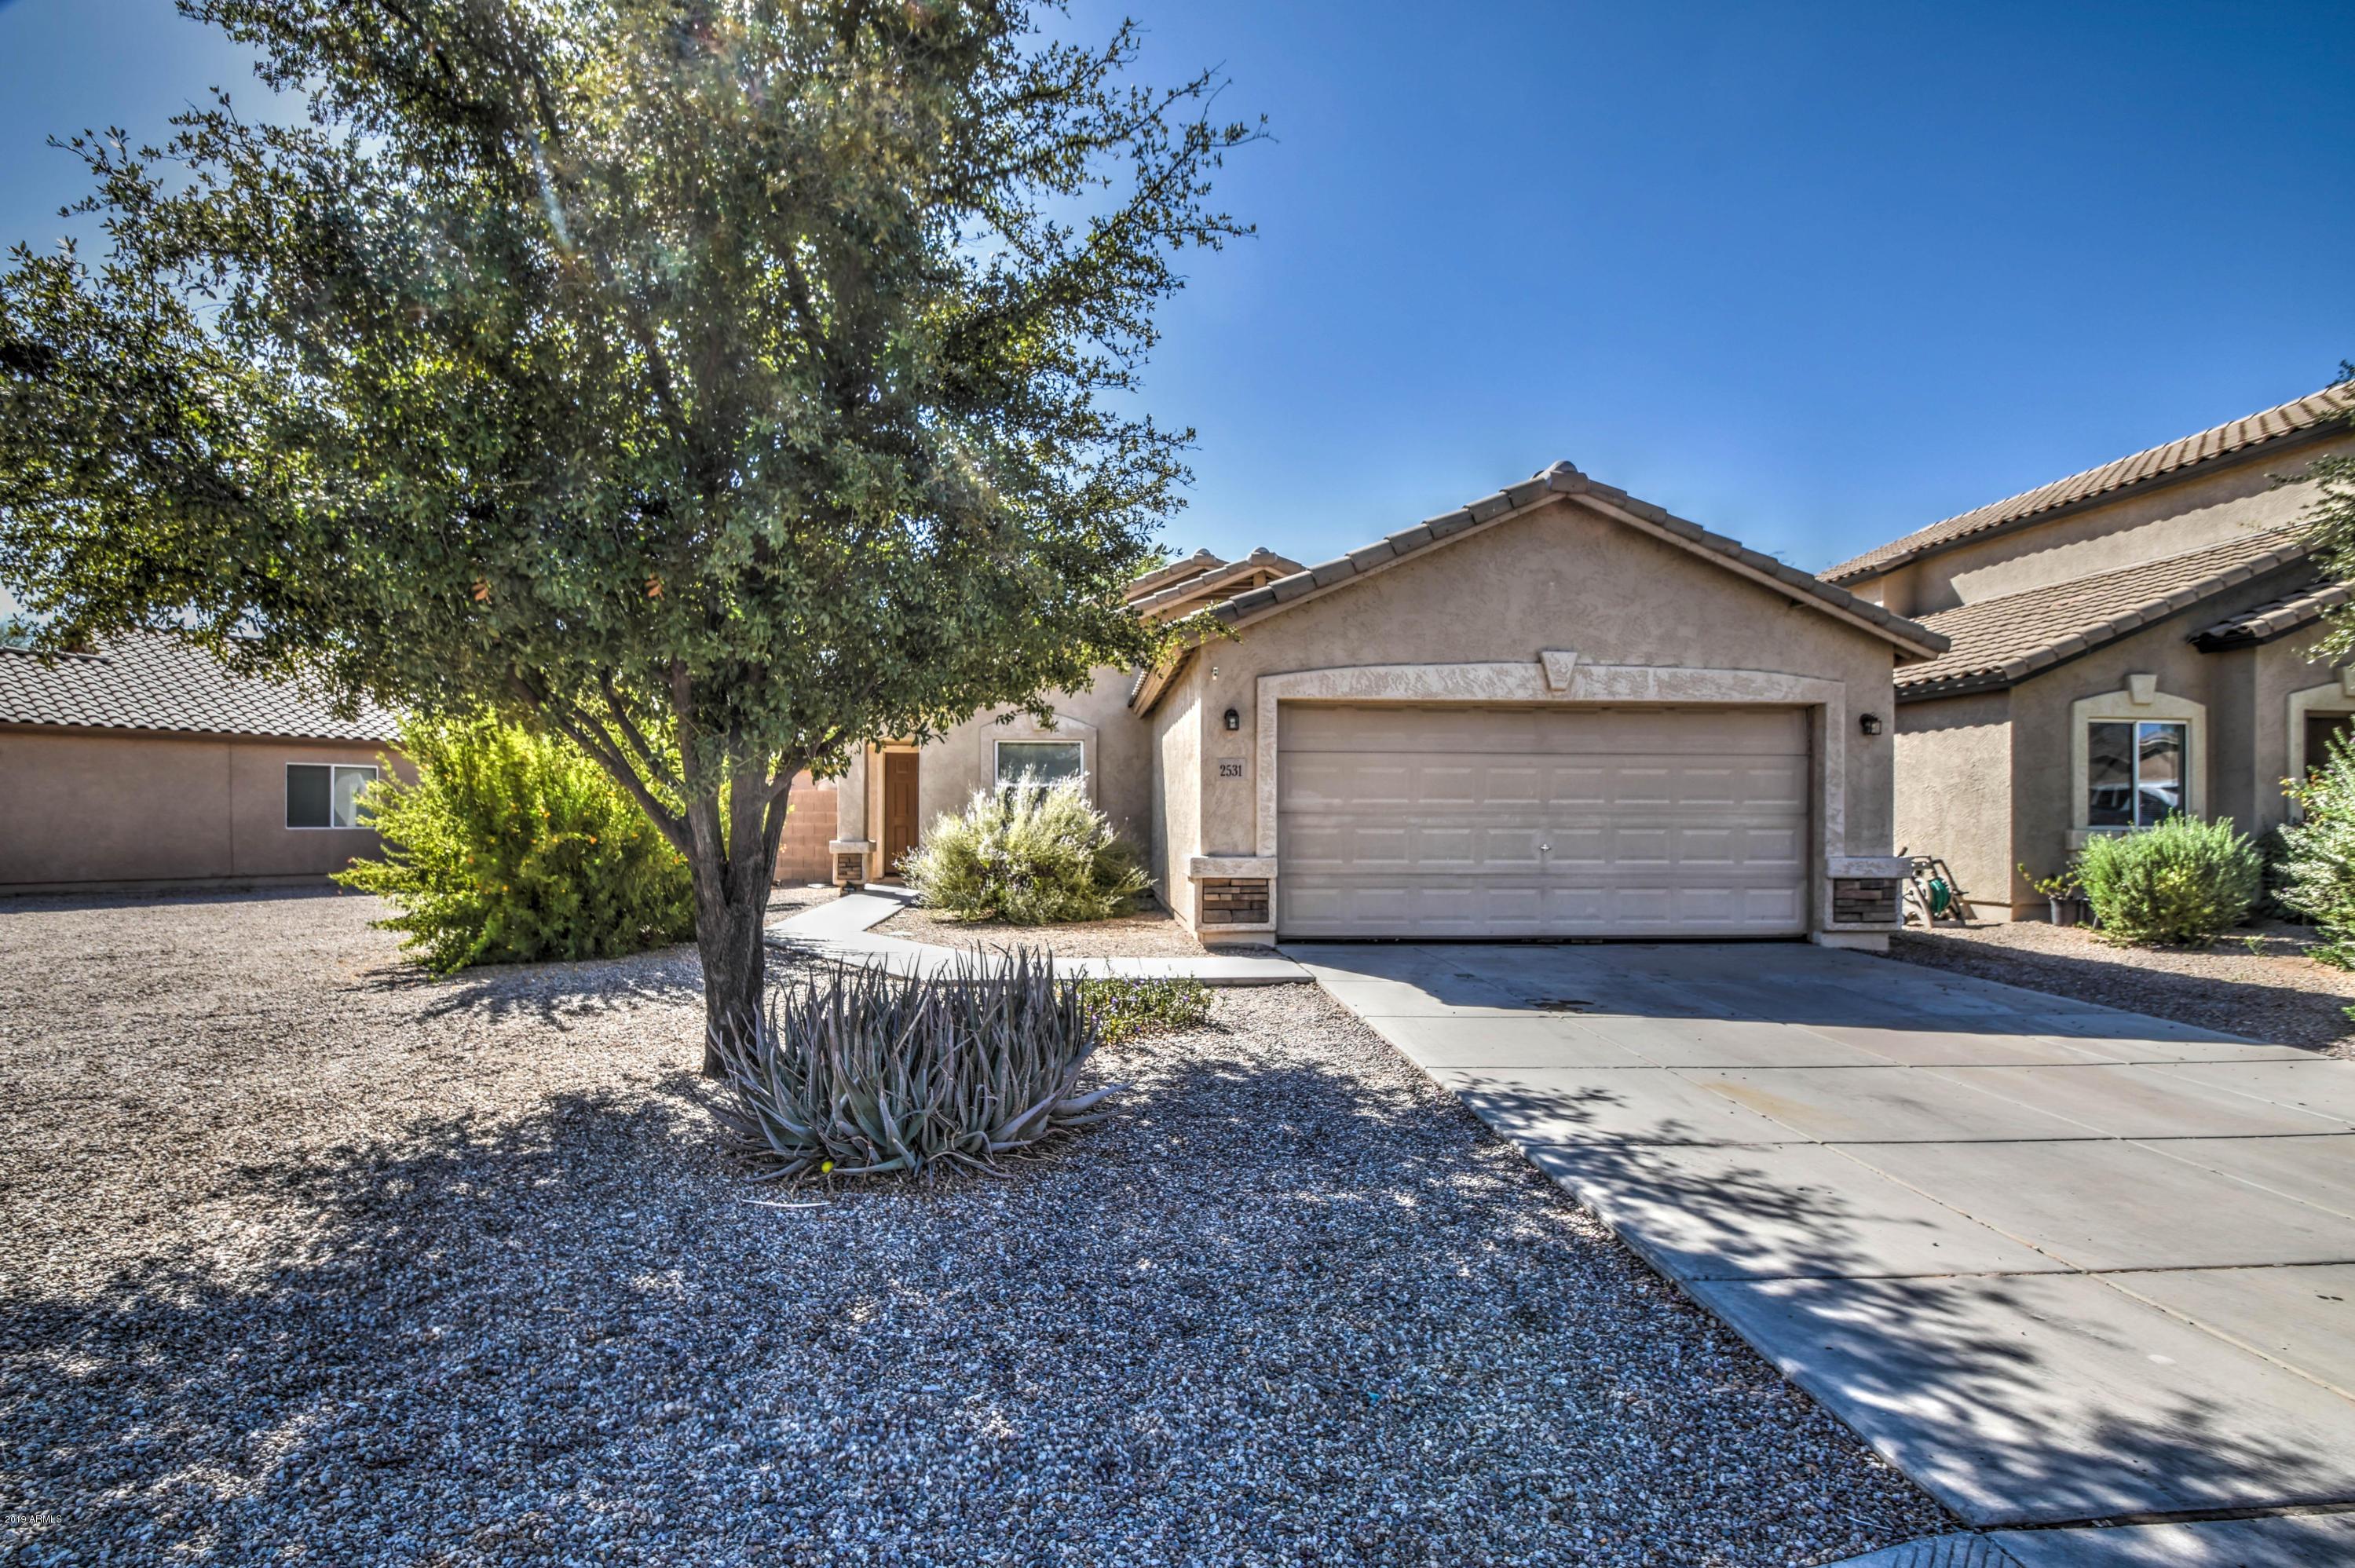 Photo of 2531 E OLIVINE Road, San Tan Valley, AZ 85143